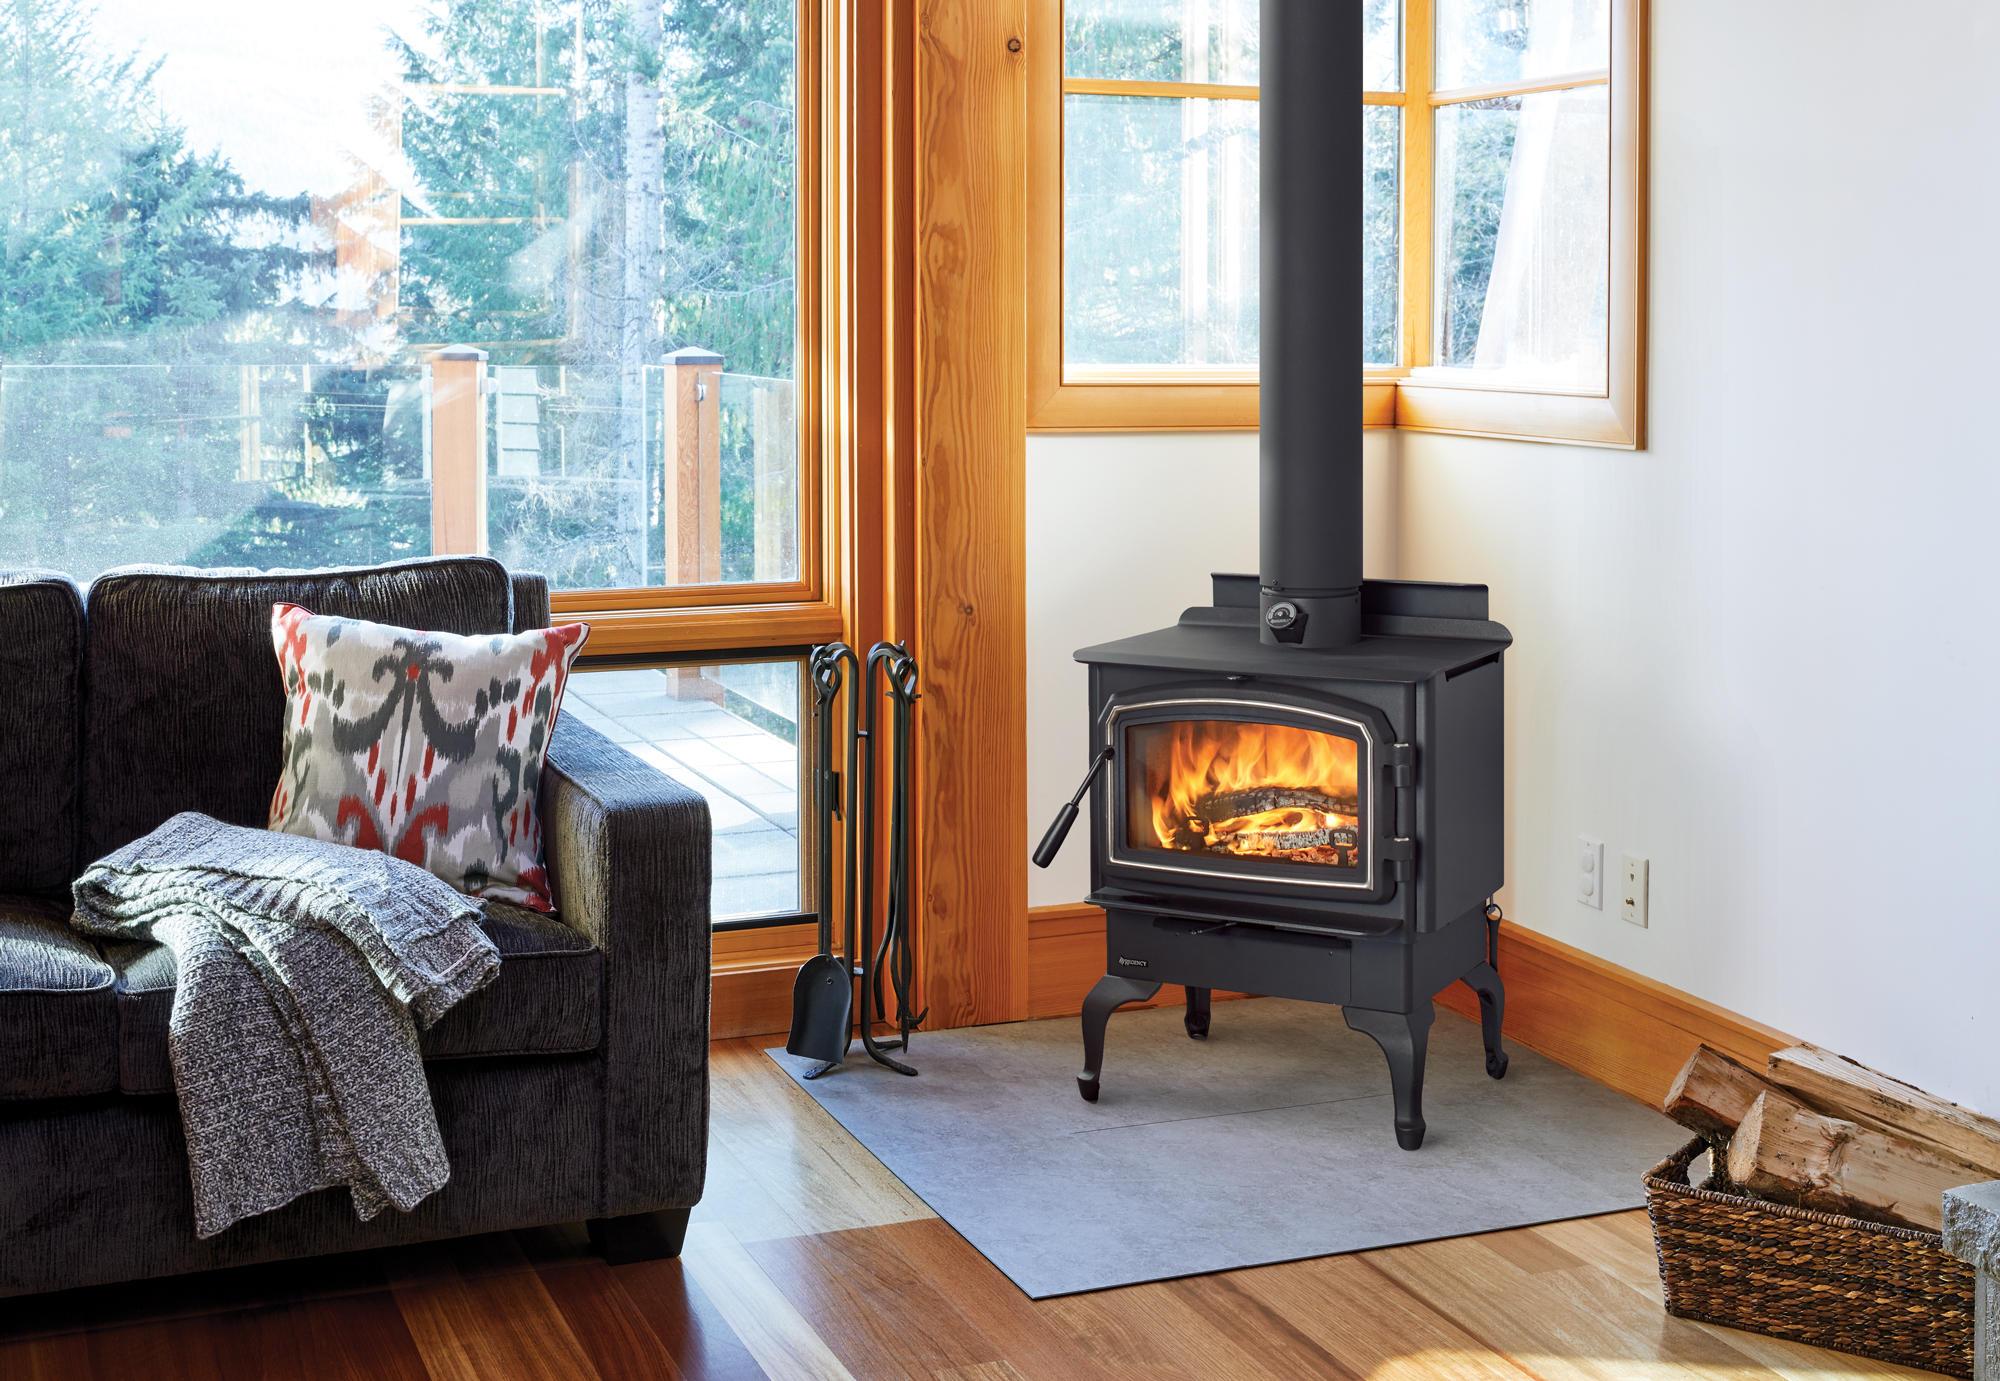 Fireplace Gallery in Edmonton: Regency Cascades F1500 Hybrid Catalytic Wood Burning Stove